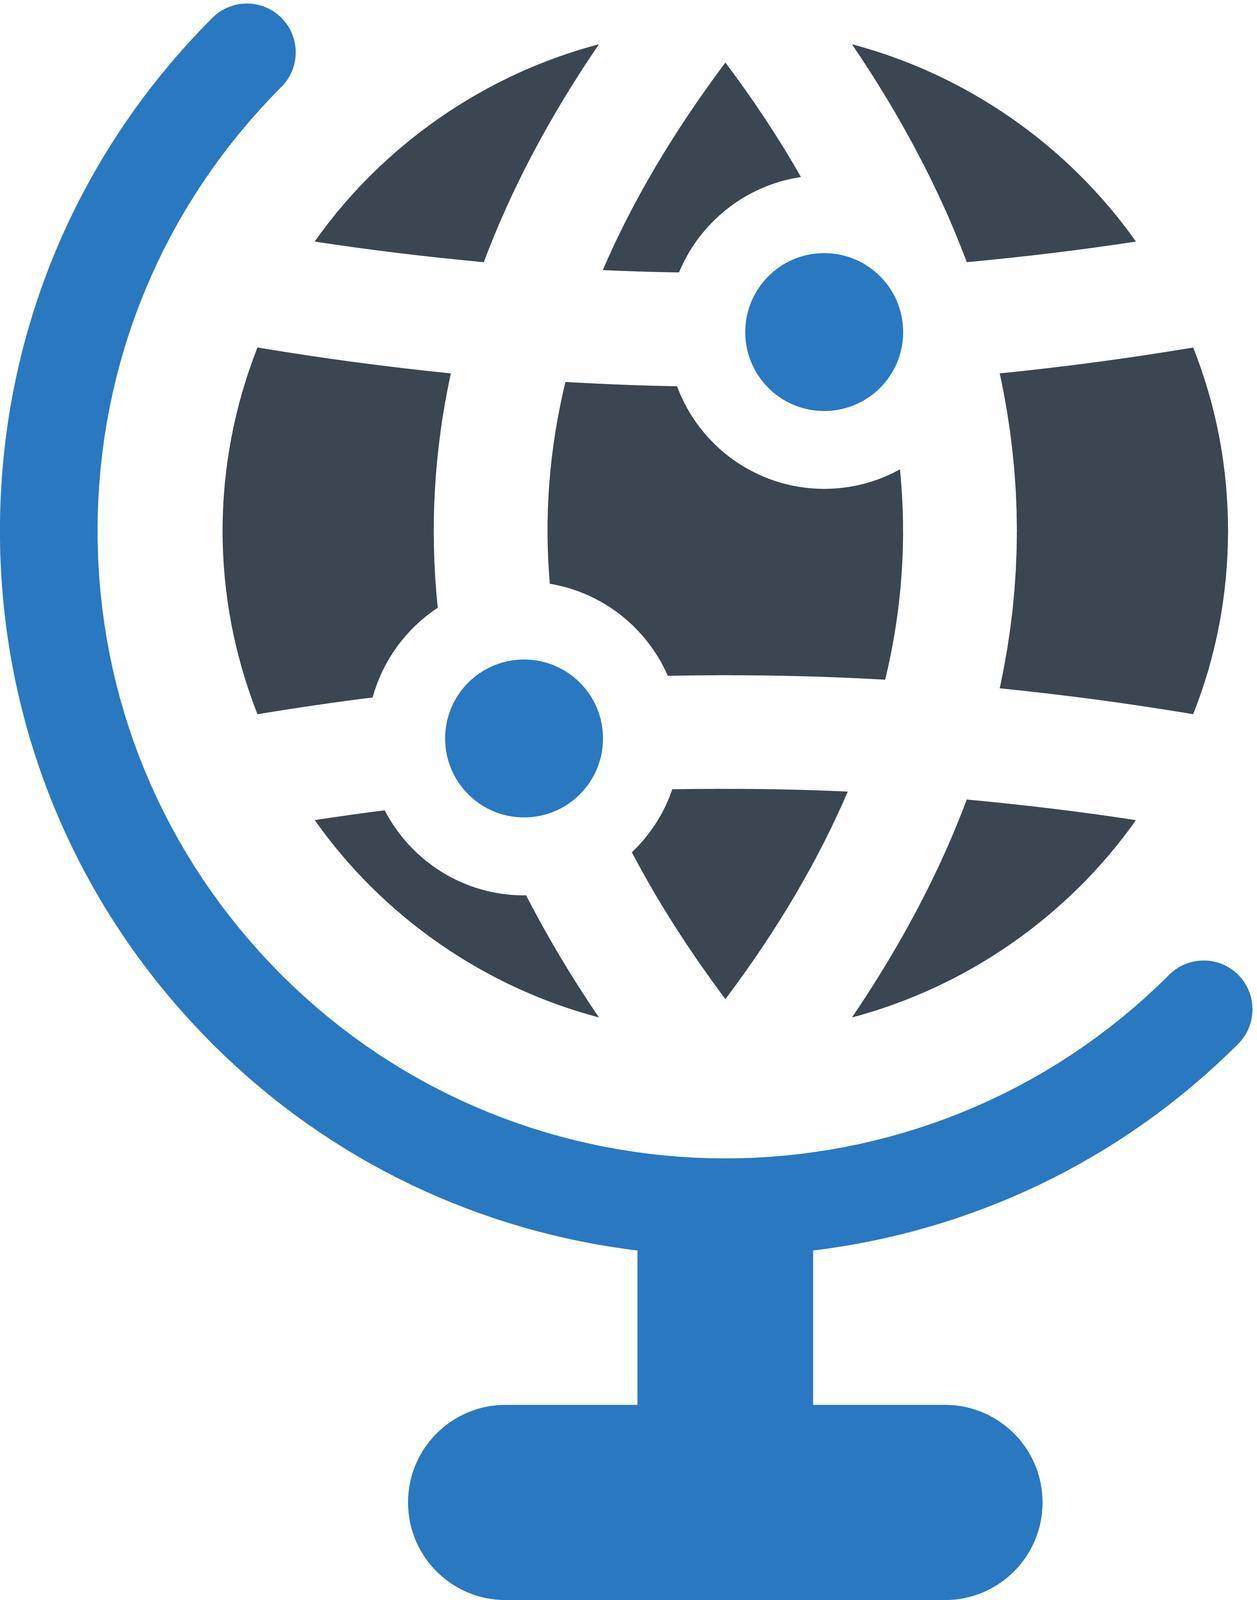 Global icon. Vector EPS file.